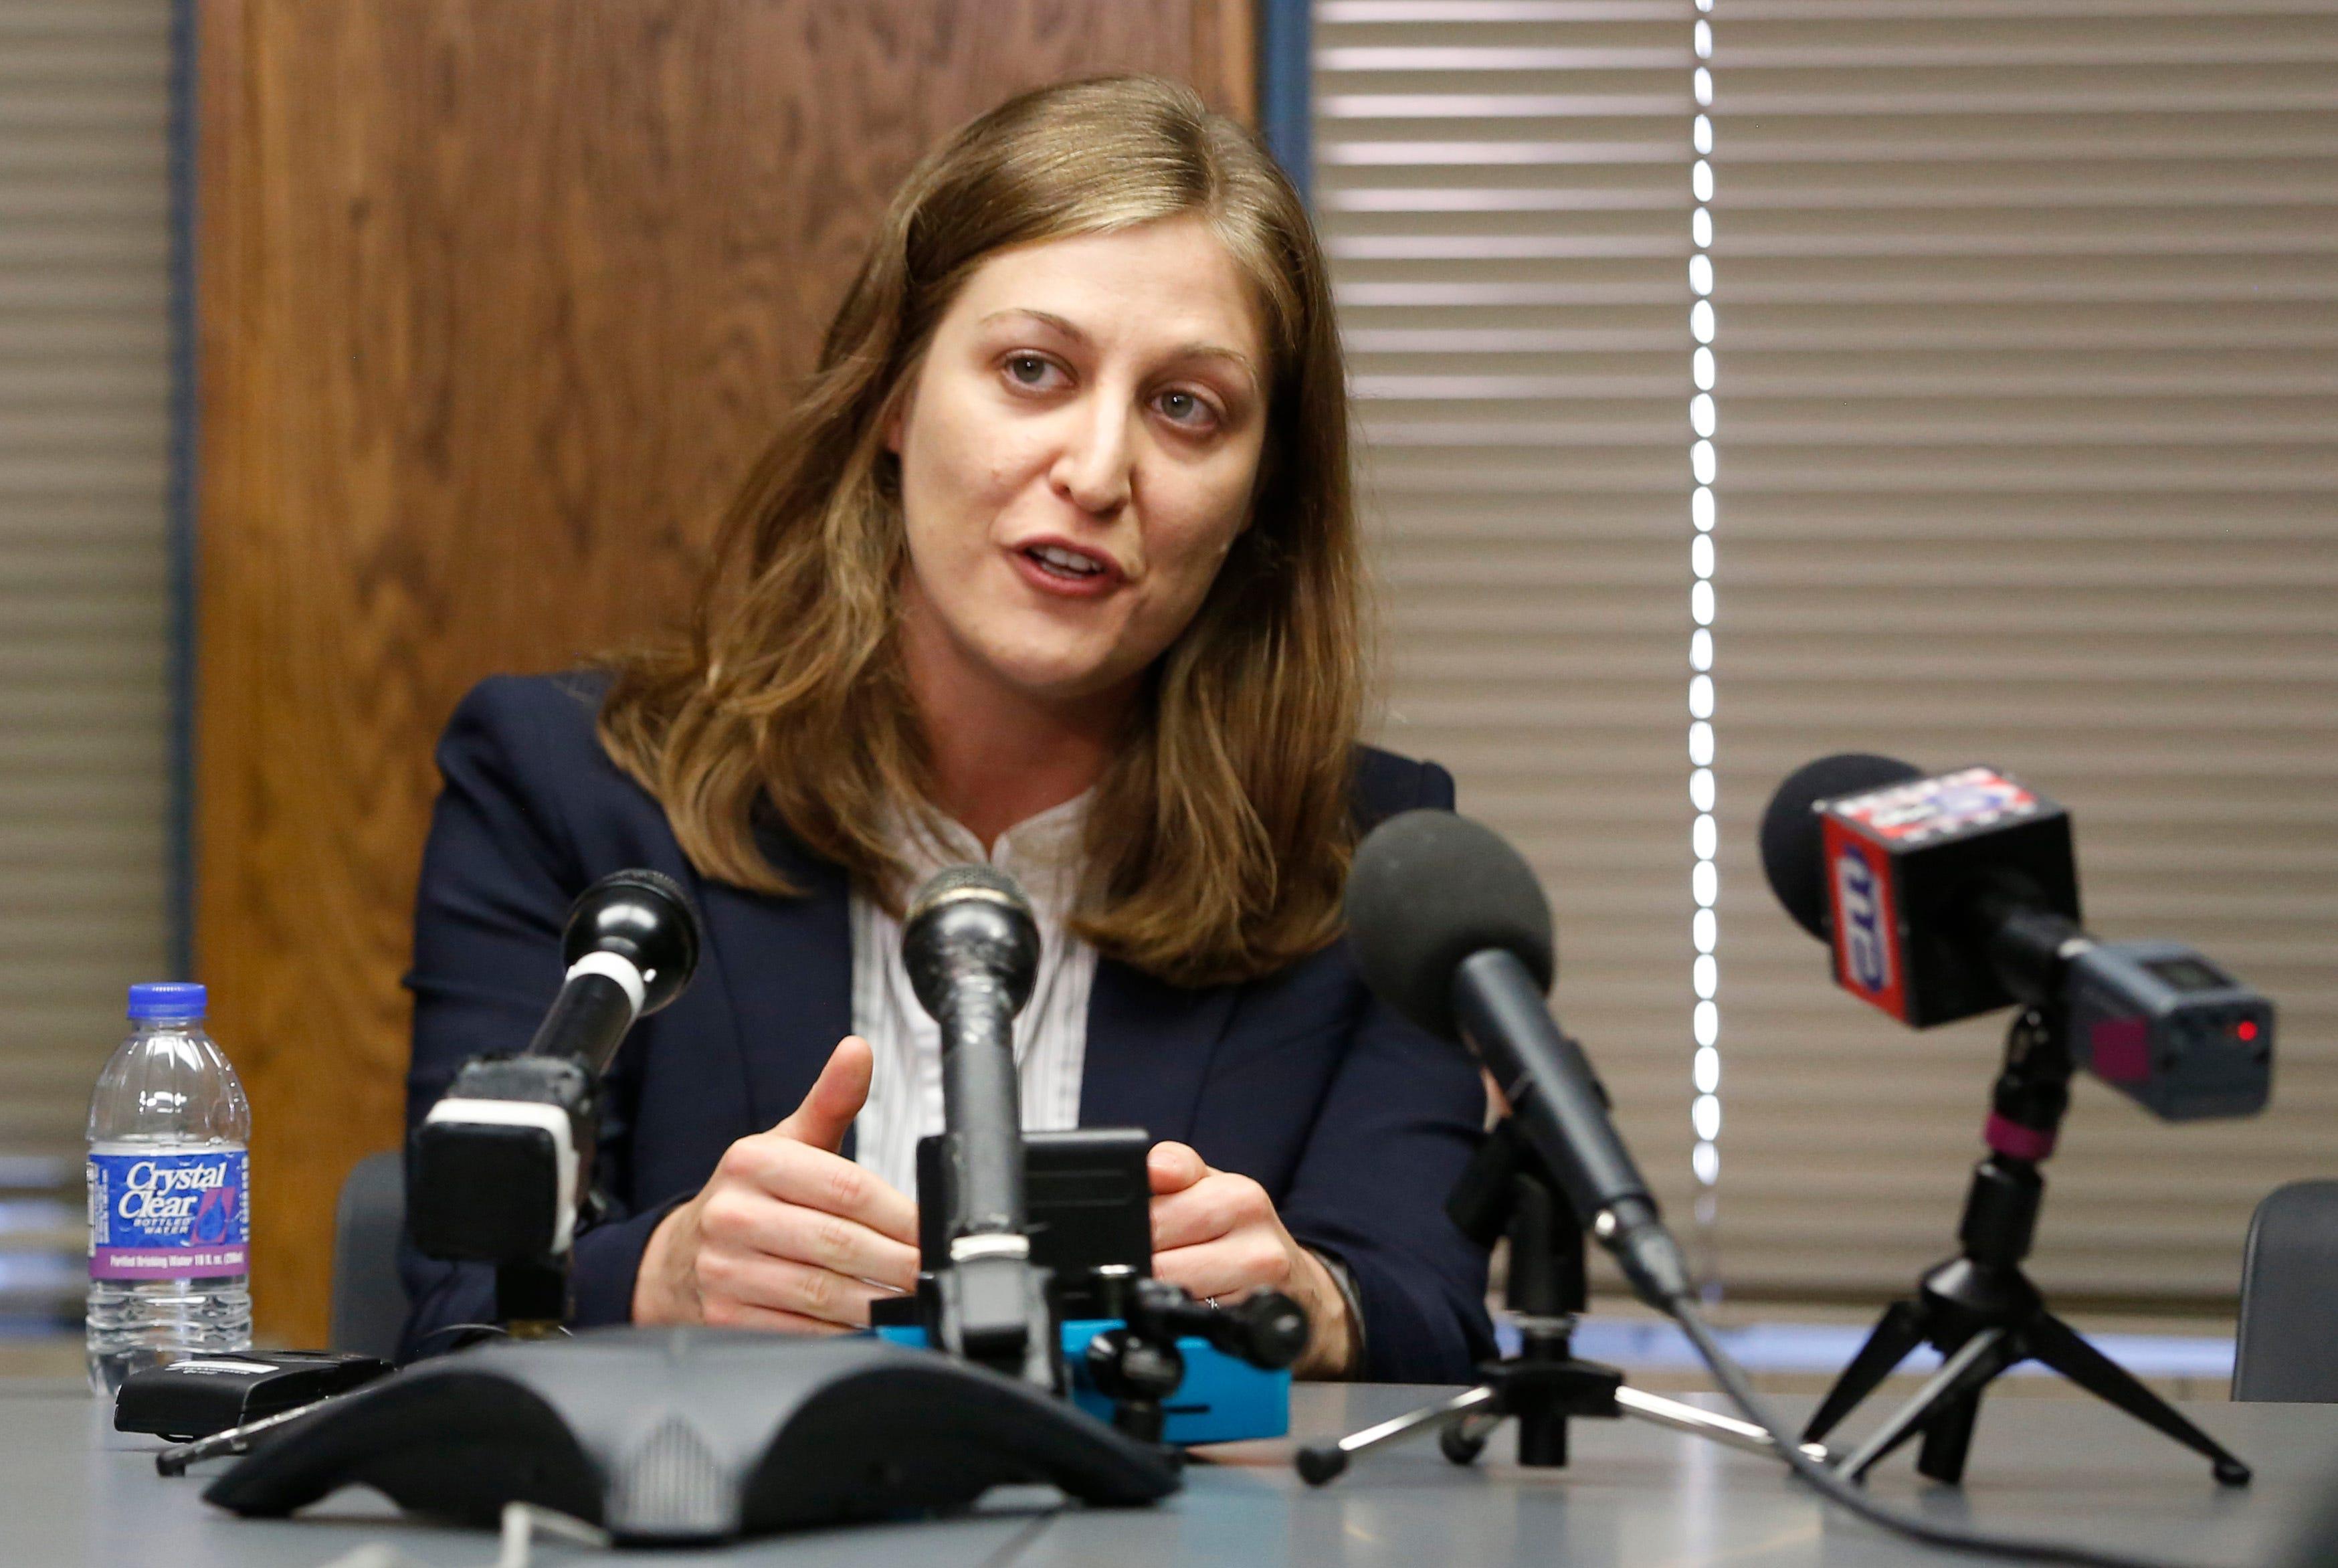 Planned Parenthood asks judge to decide fetal heartbeat case without a trial